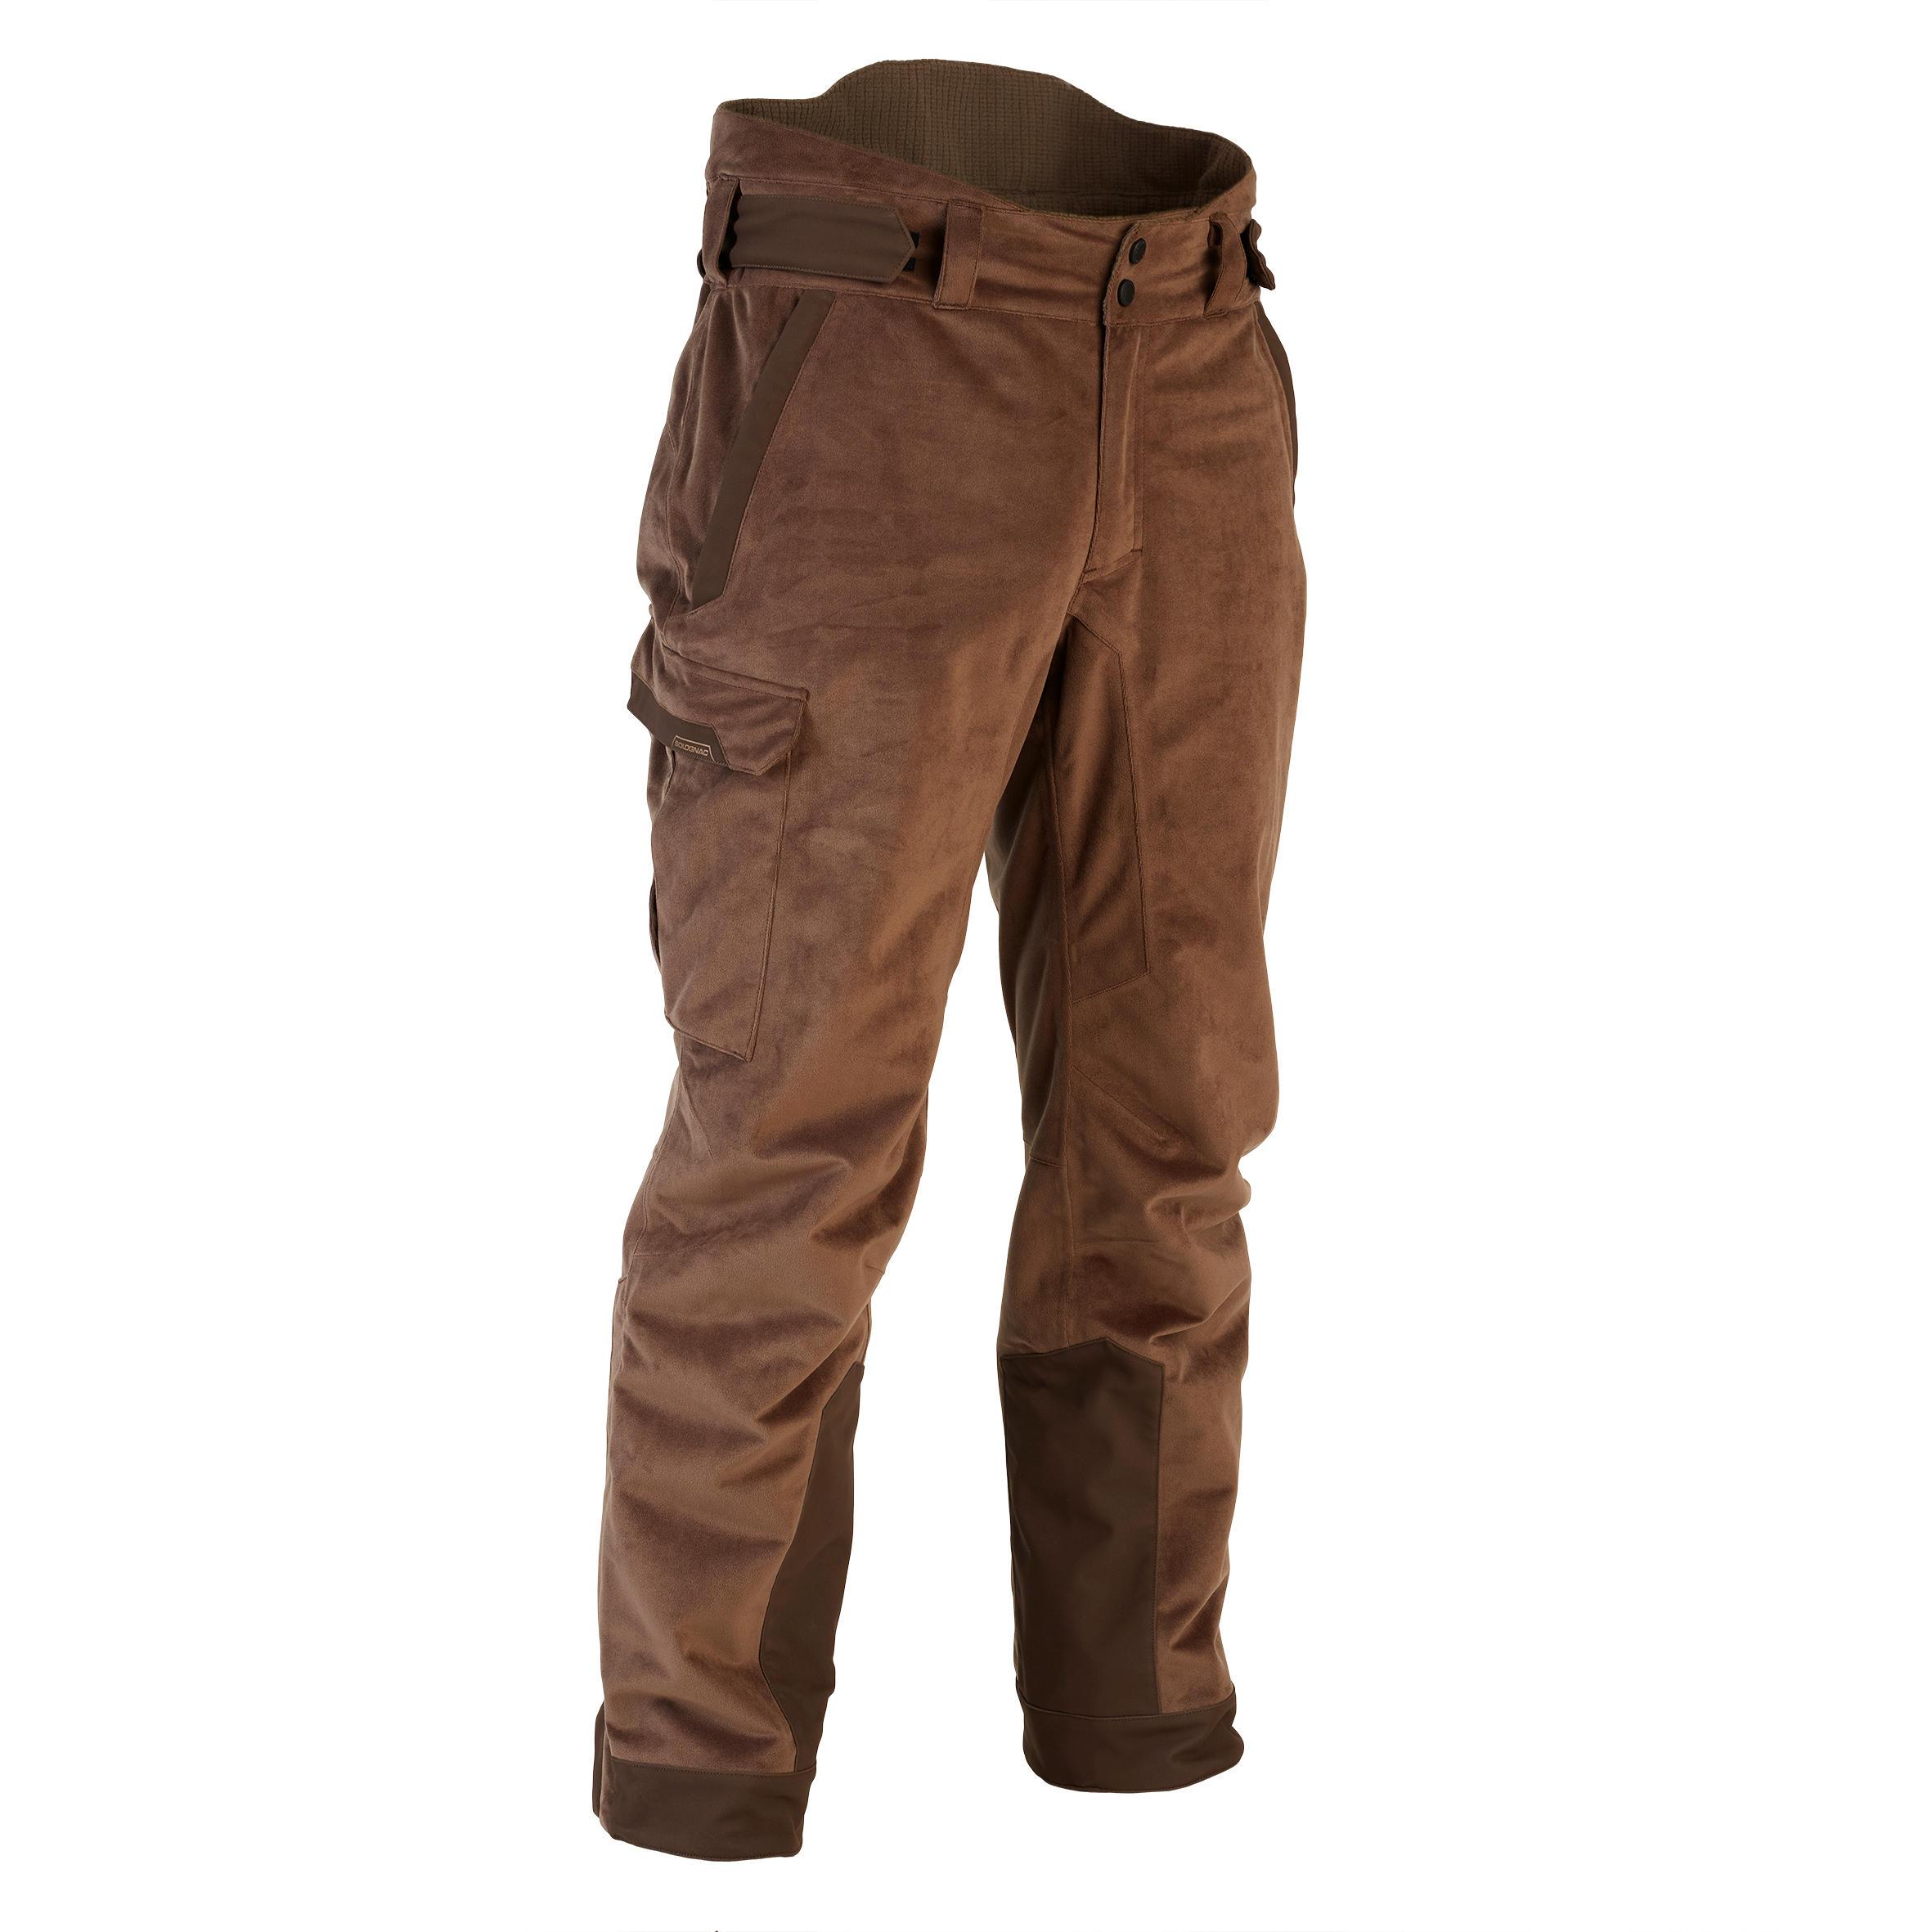 REGENHOSE JAGD 900 WASSERDICHT BRAUN | Sportbekleidung > Sporthosen > Regenhosen | Solognac